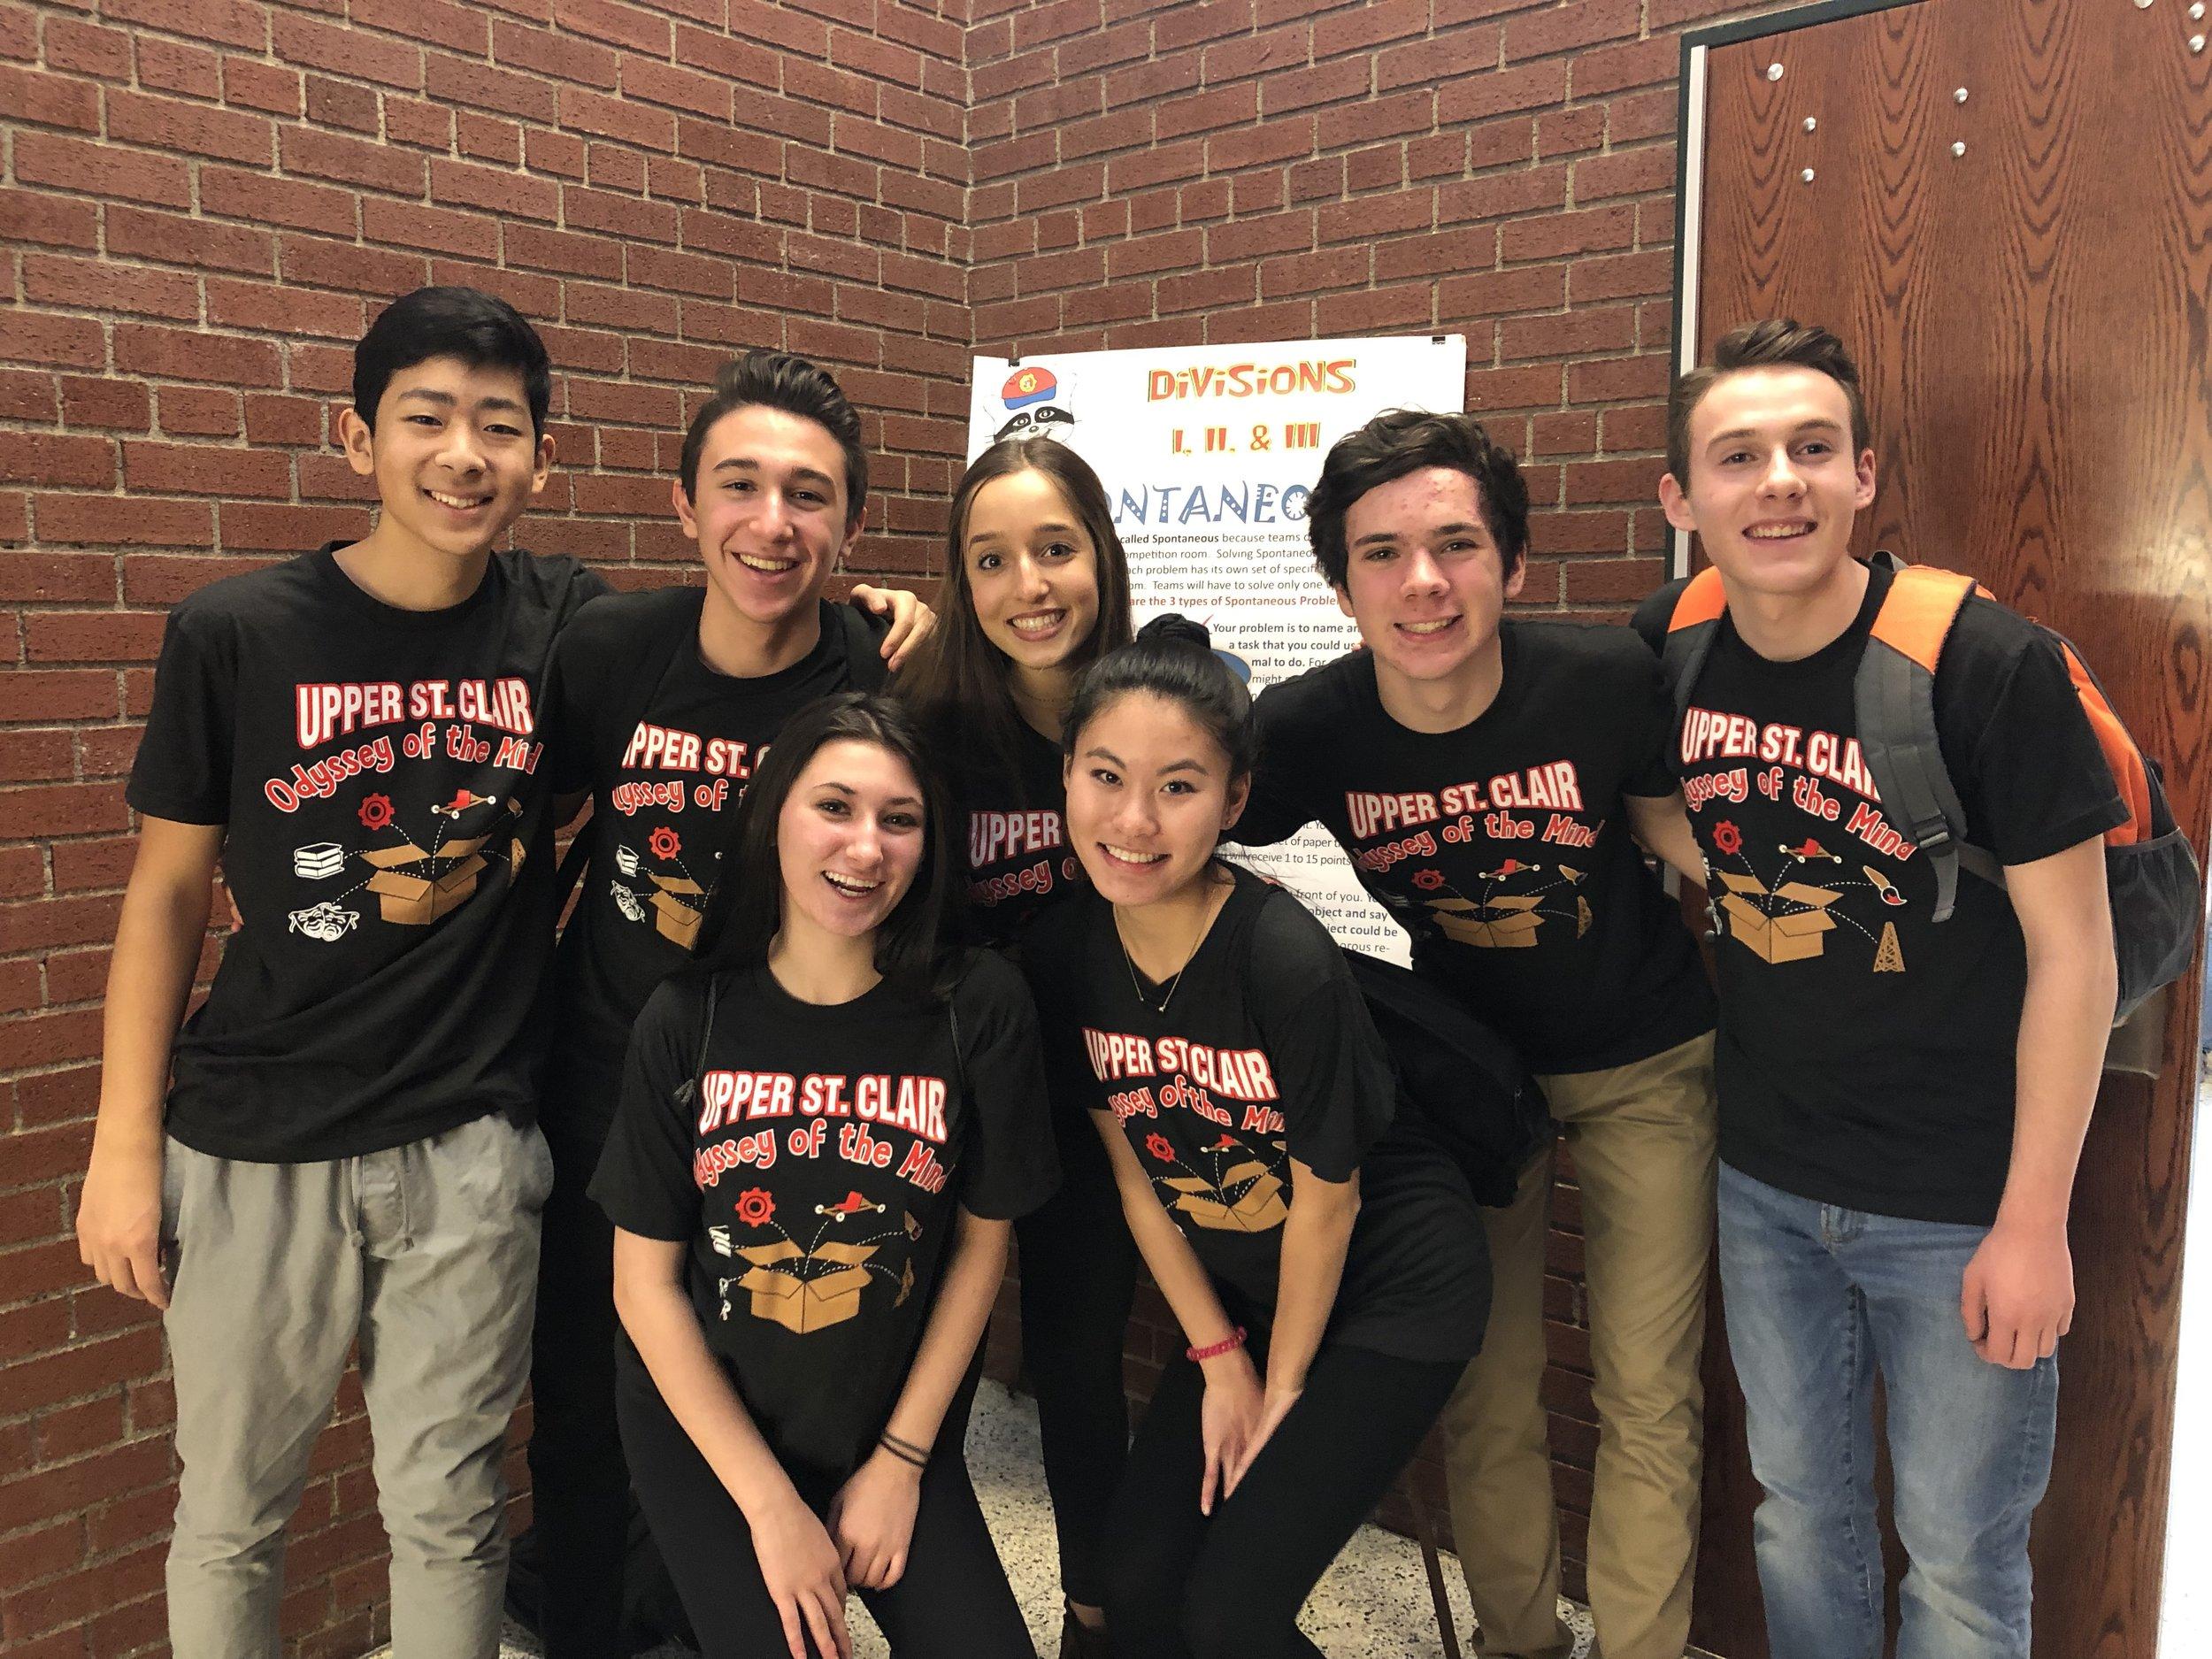 USCHS - 1st place P5/D3